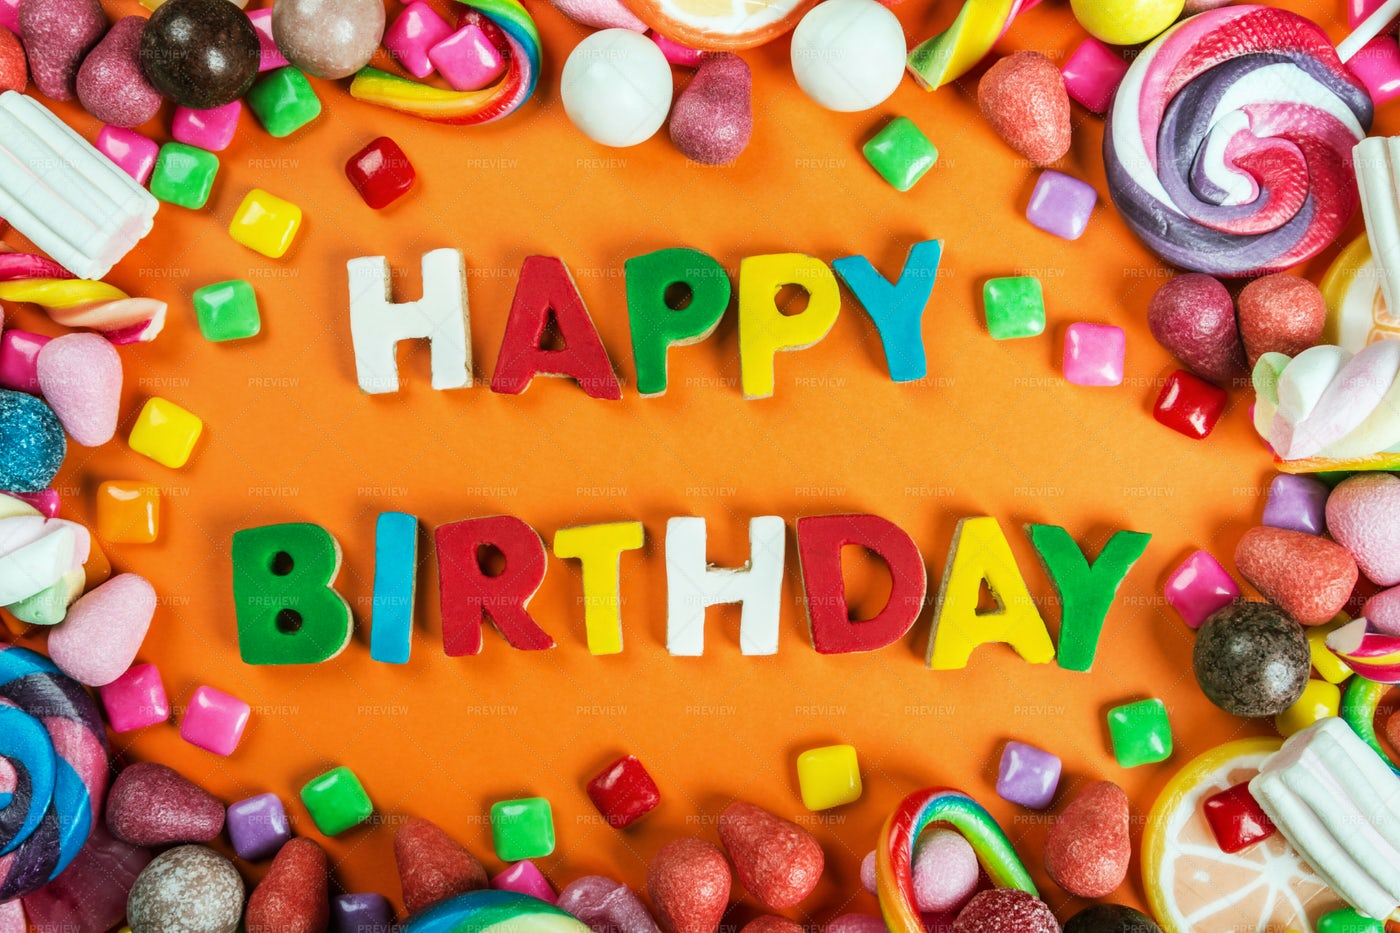 Happy Birthday In Candy: Stock Photos